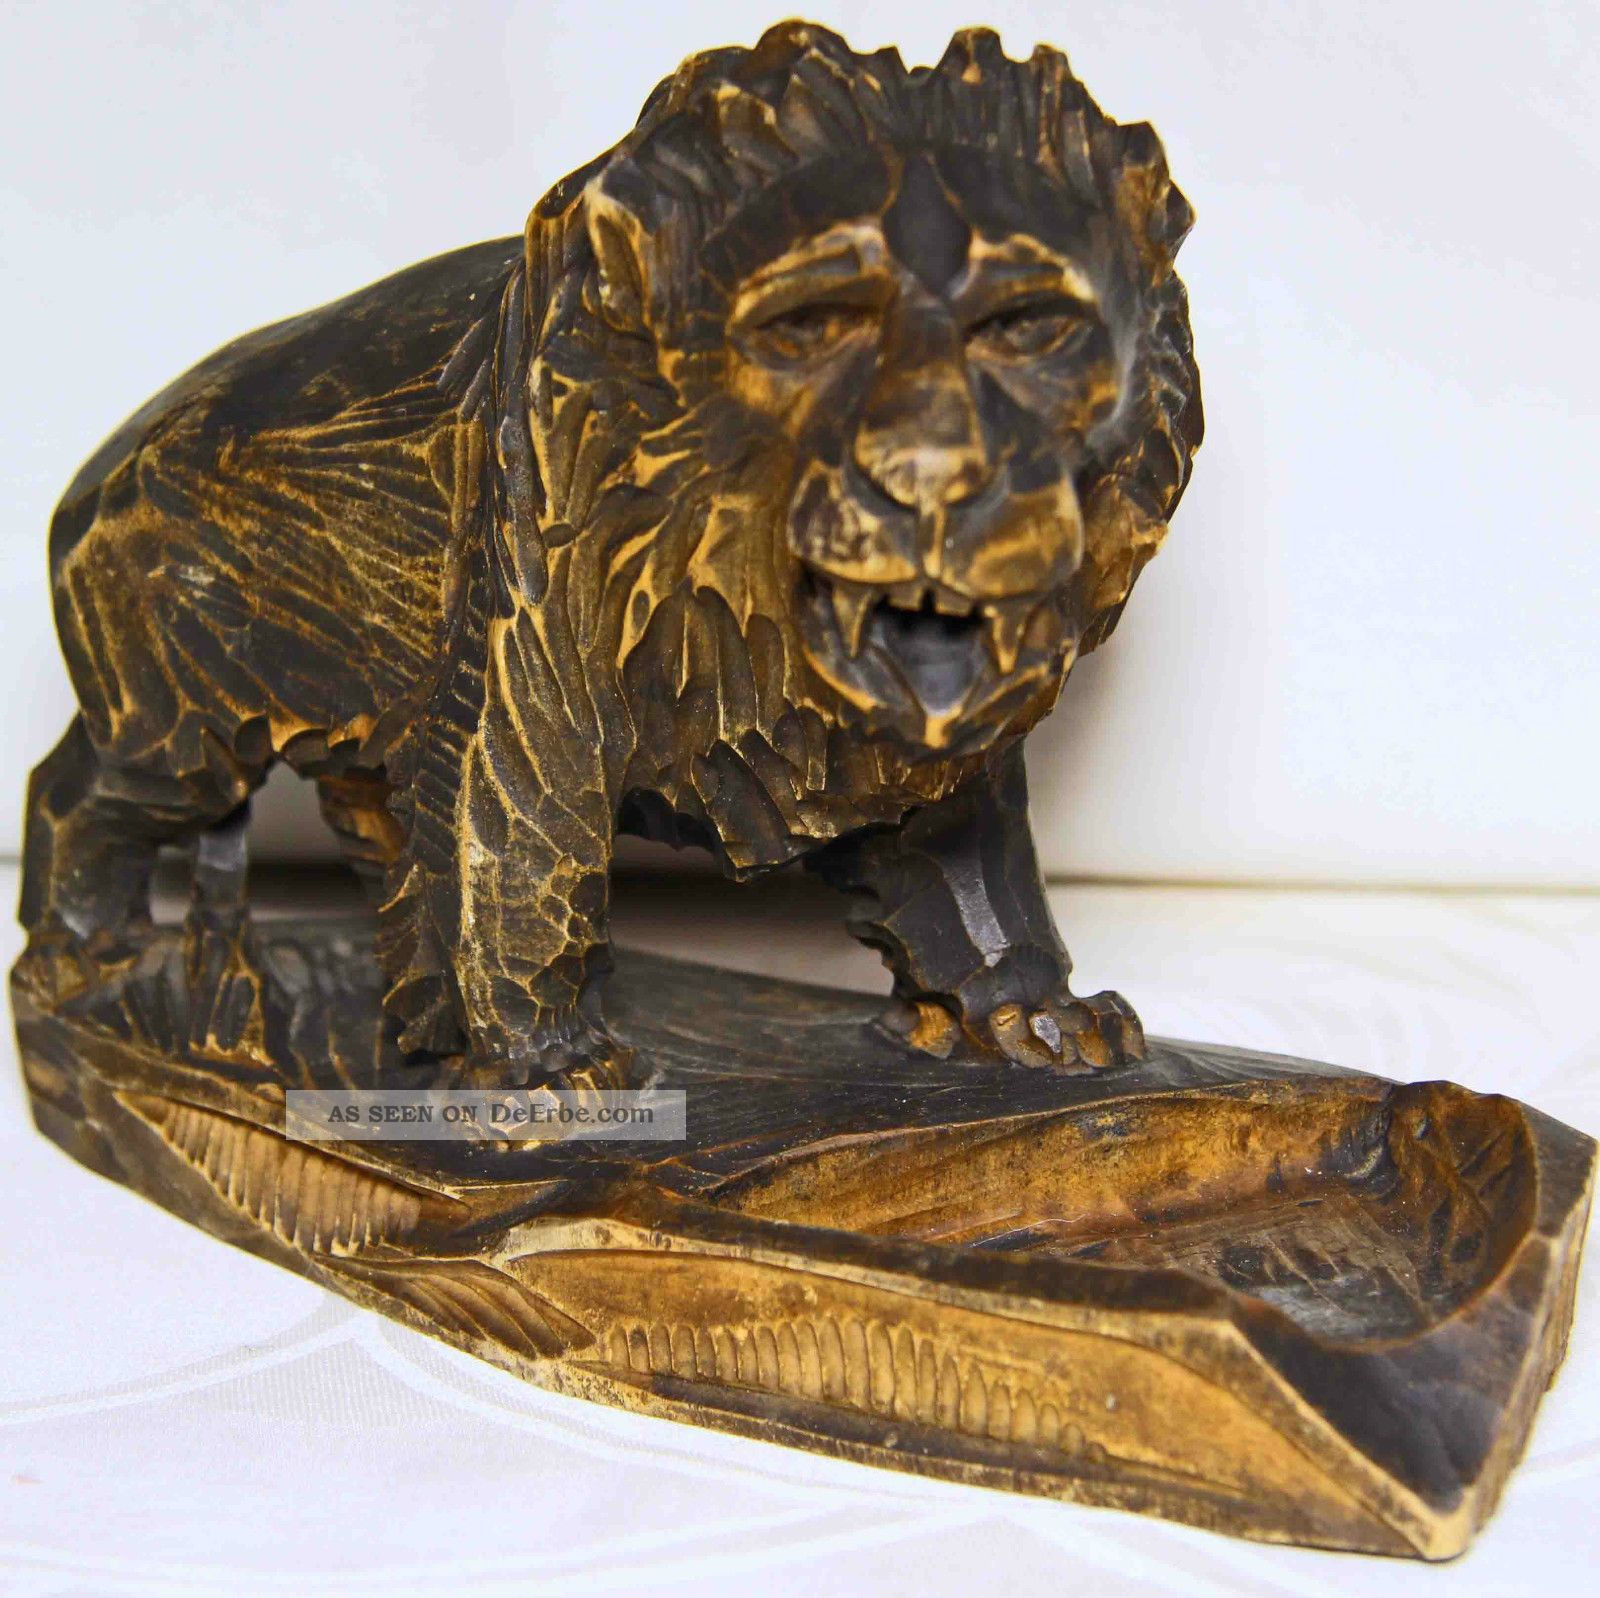 Seltene,  Antike Löwenfigur Antike Bild